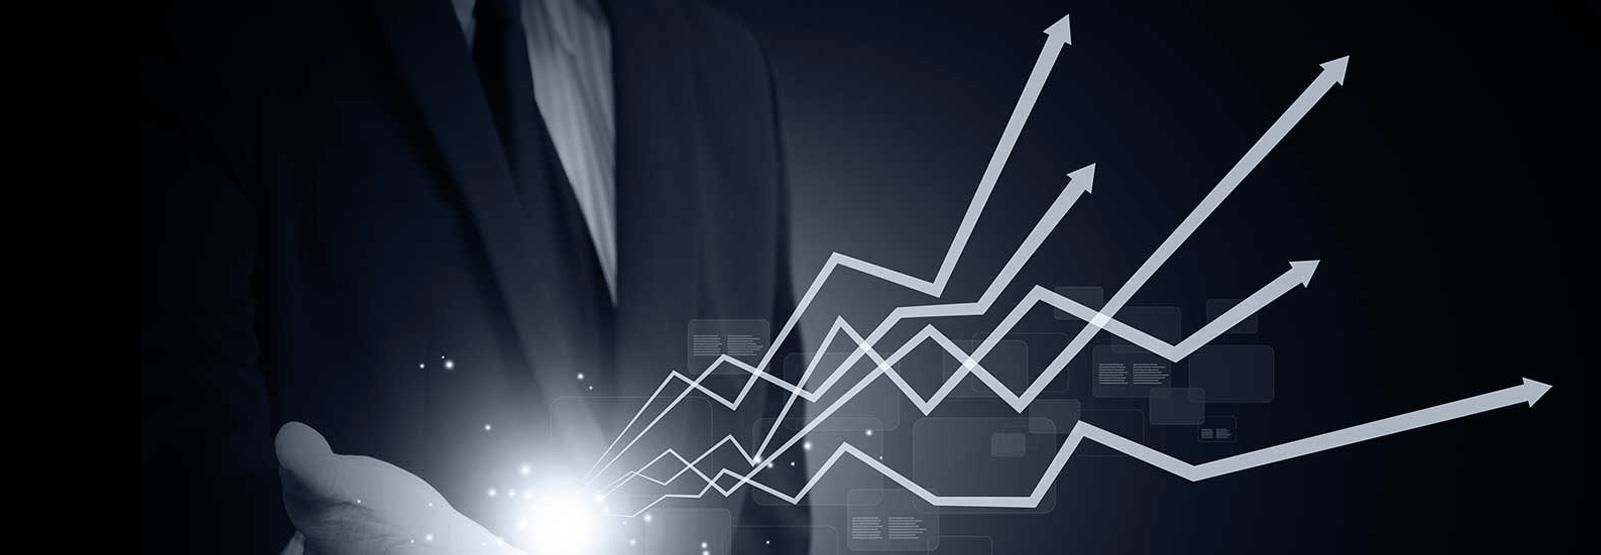 ICEBERG - Business growth